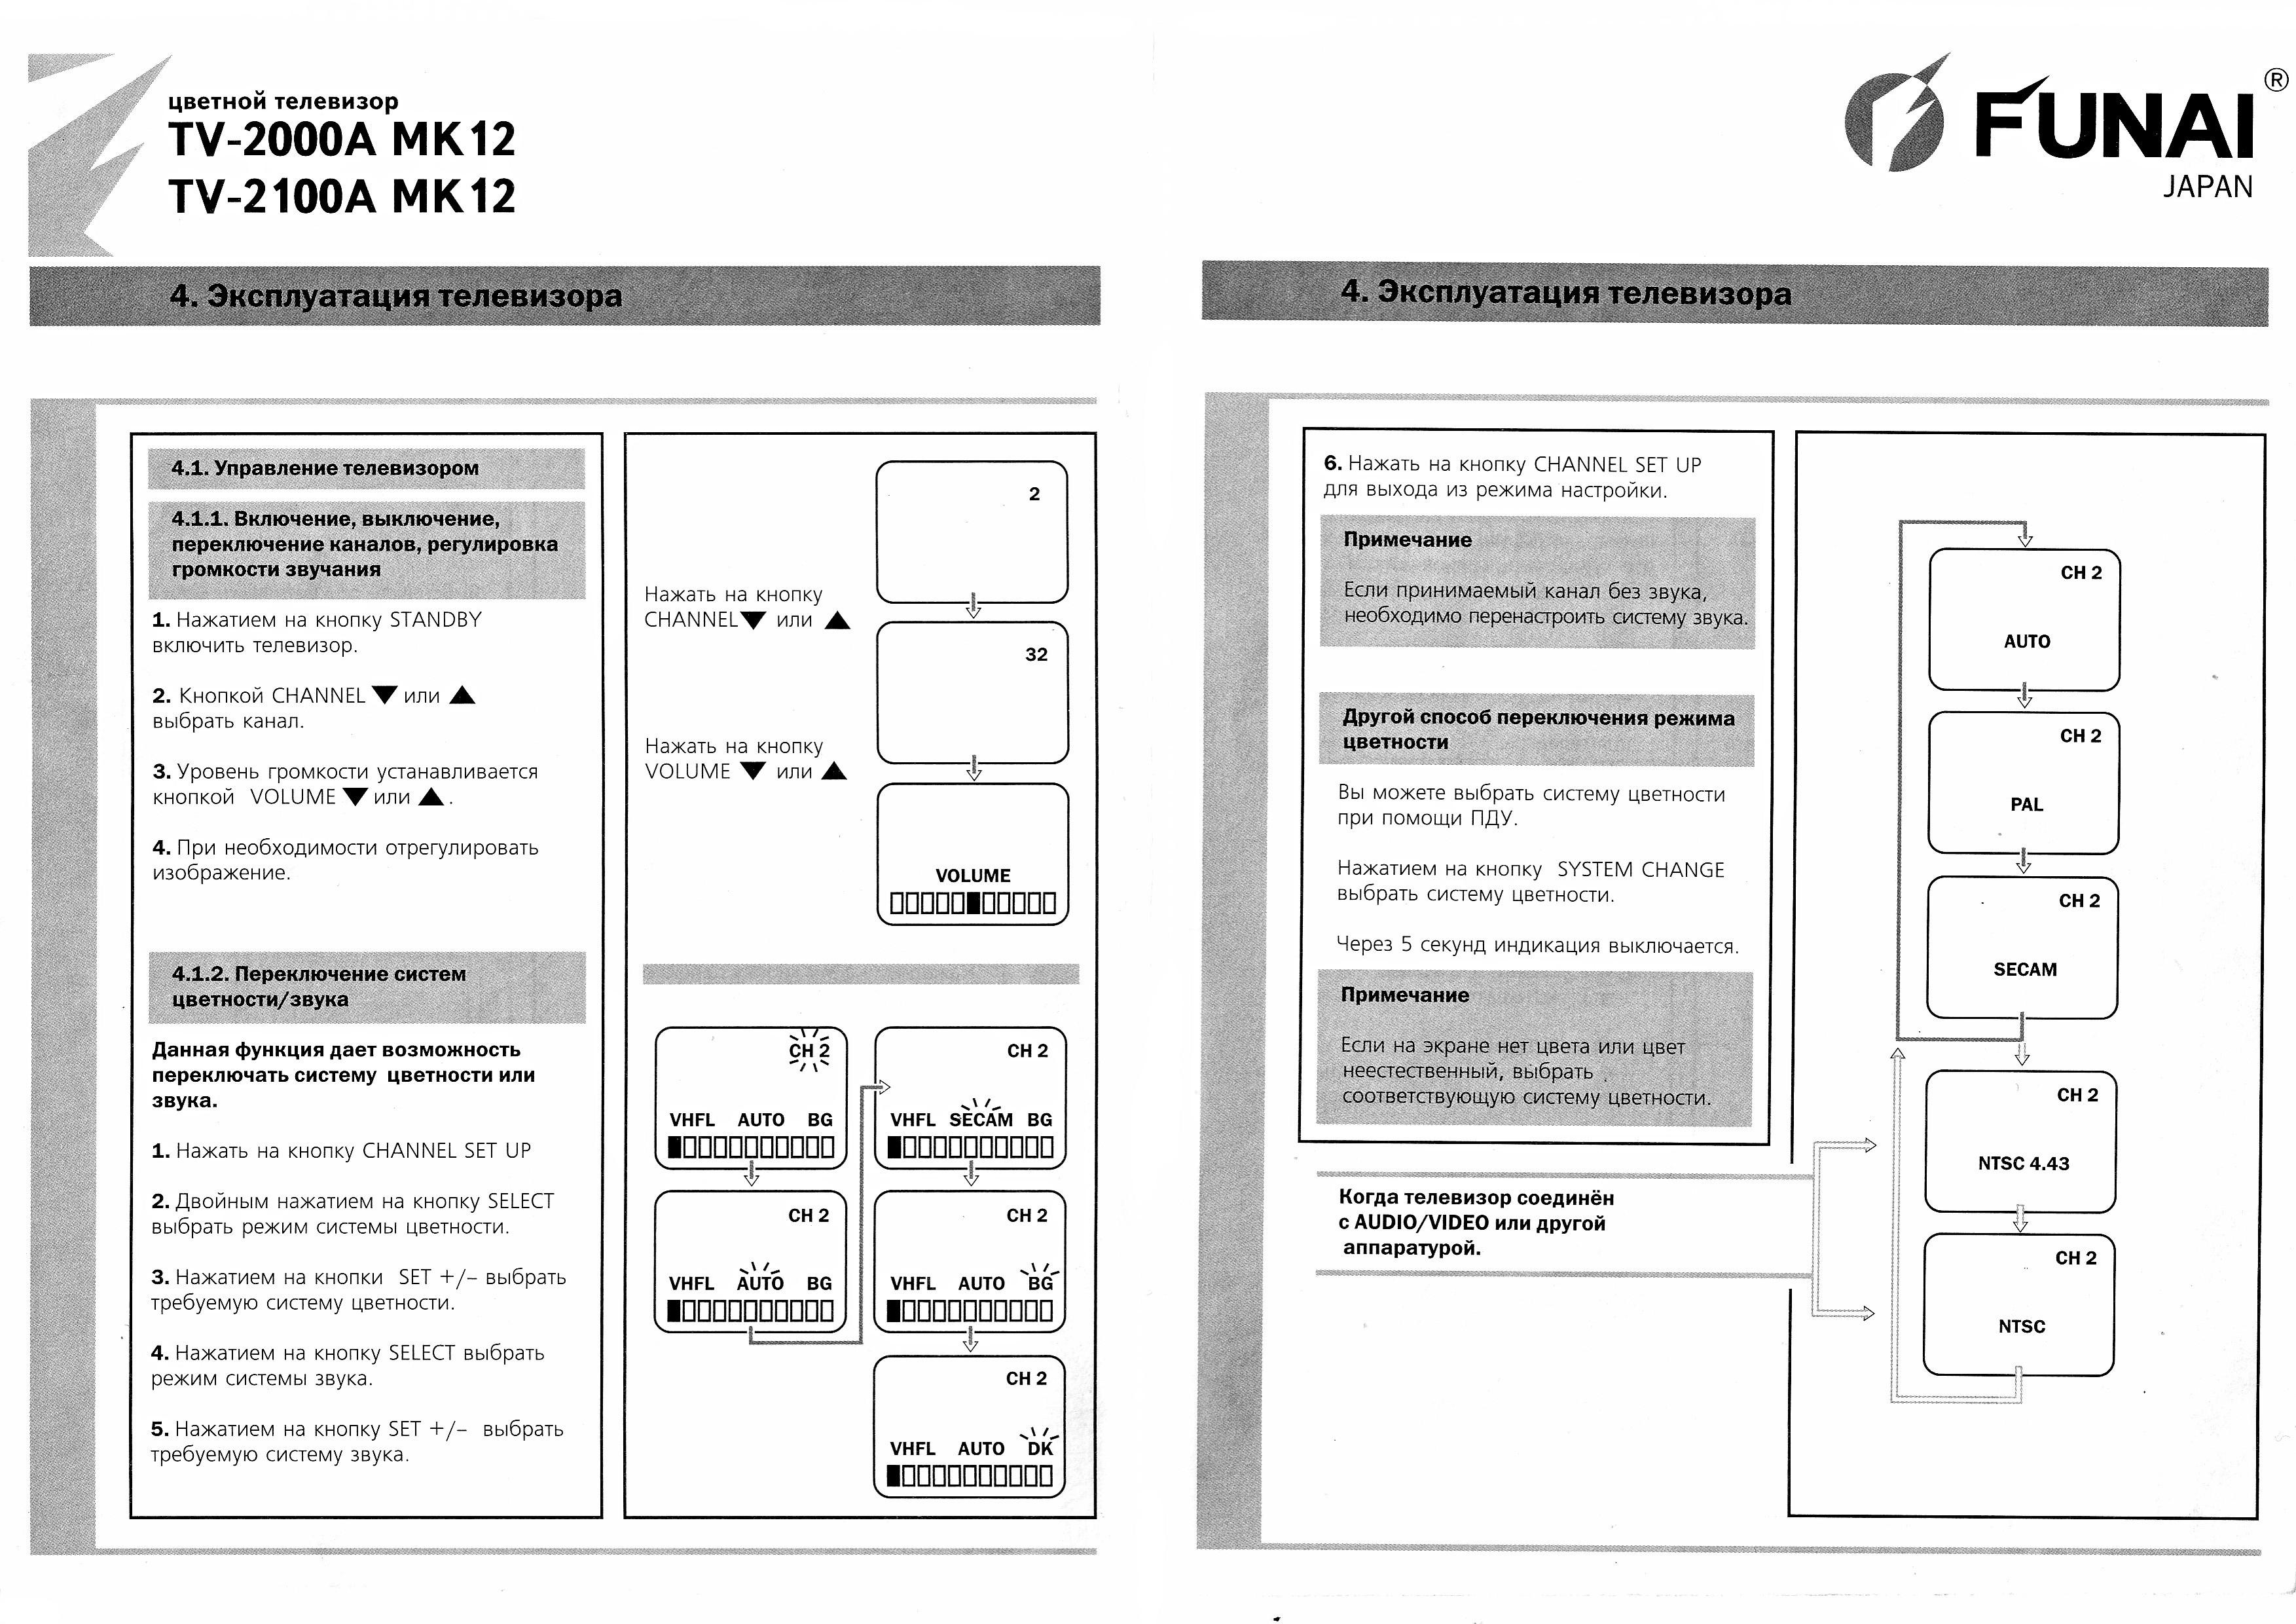 Схемы телевизоров FUNAI  monitornetru